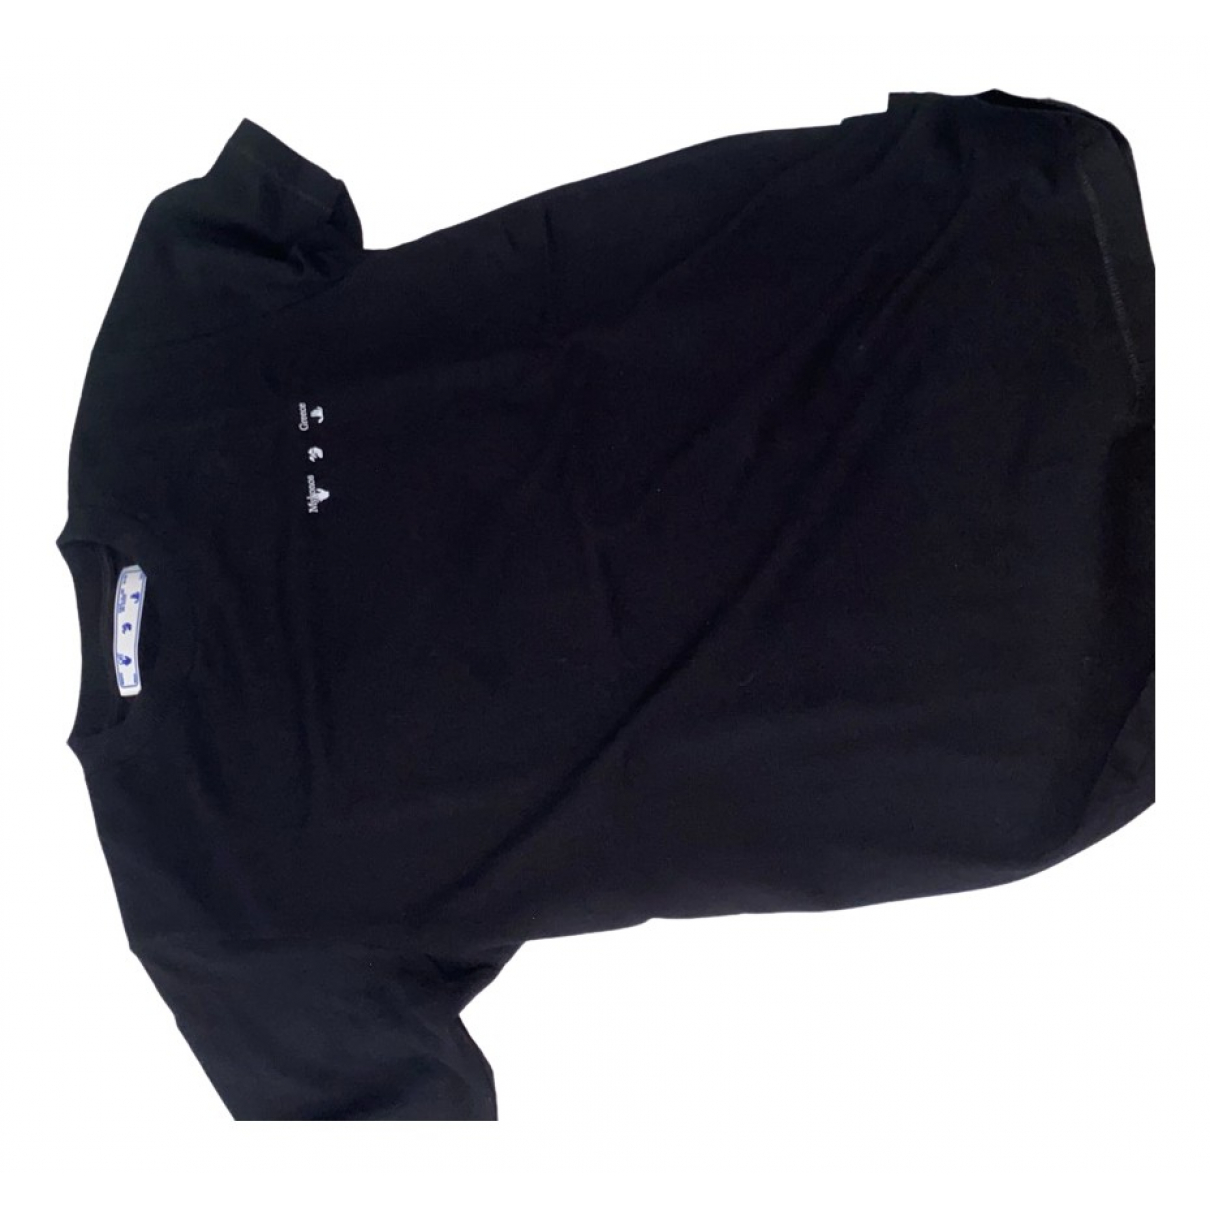 Off-white N Black T-shirts for Men 37 EU (tour de cou / collar)